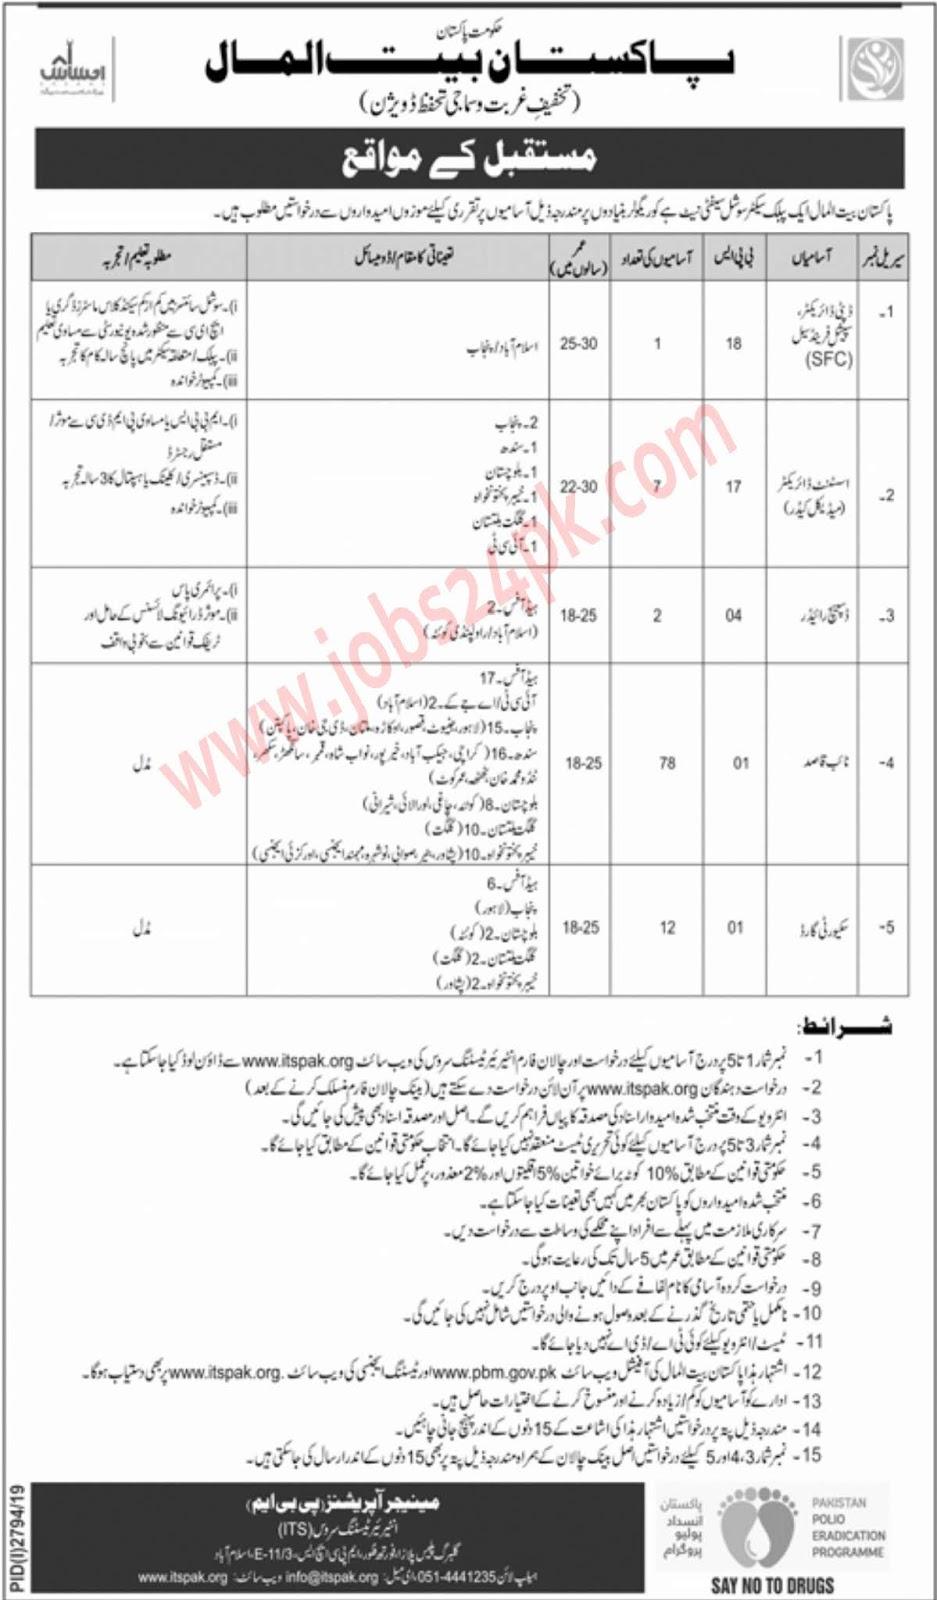 Pakistan Bait UL Mall Latest Jobs November 2019